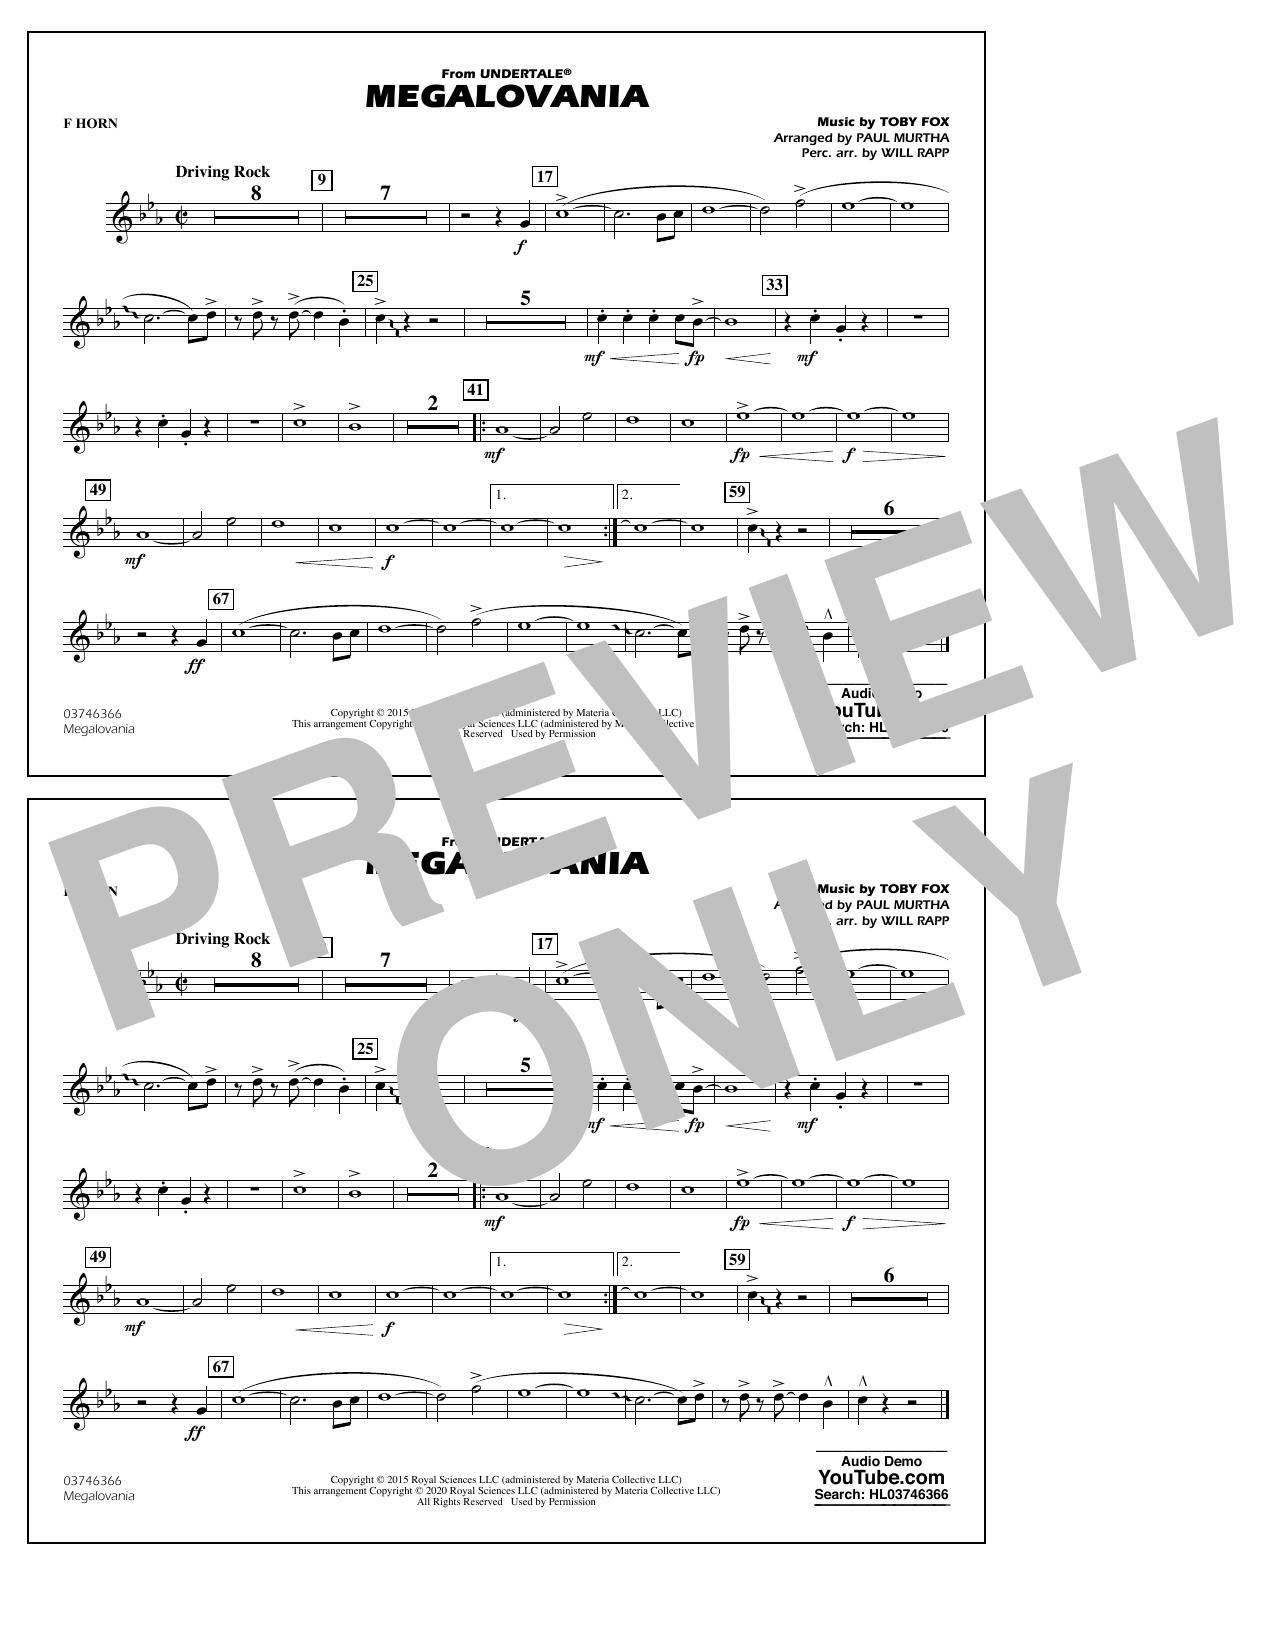 Megalovania (from Undertale) (arr. Paul Murtha) - F Horn Sheet Music